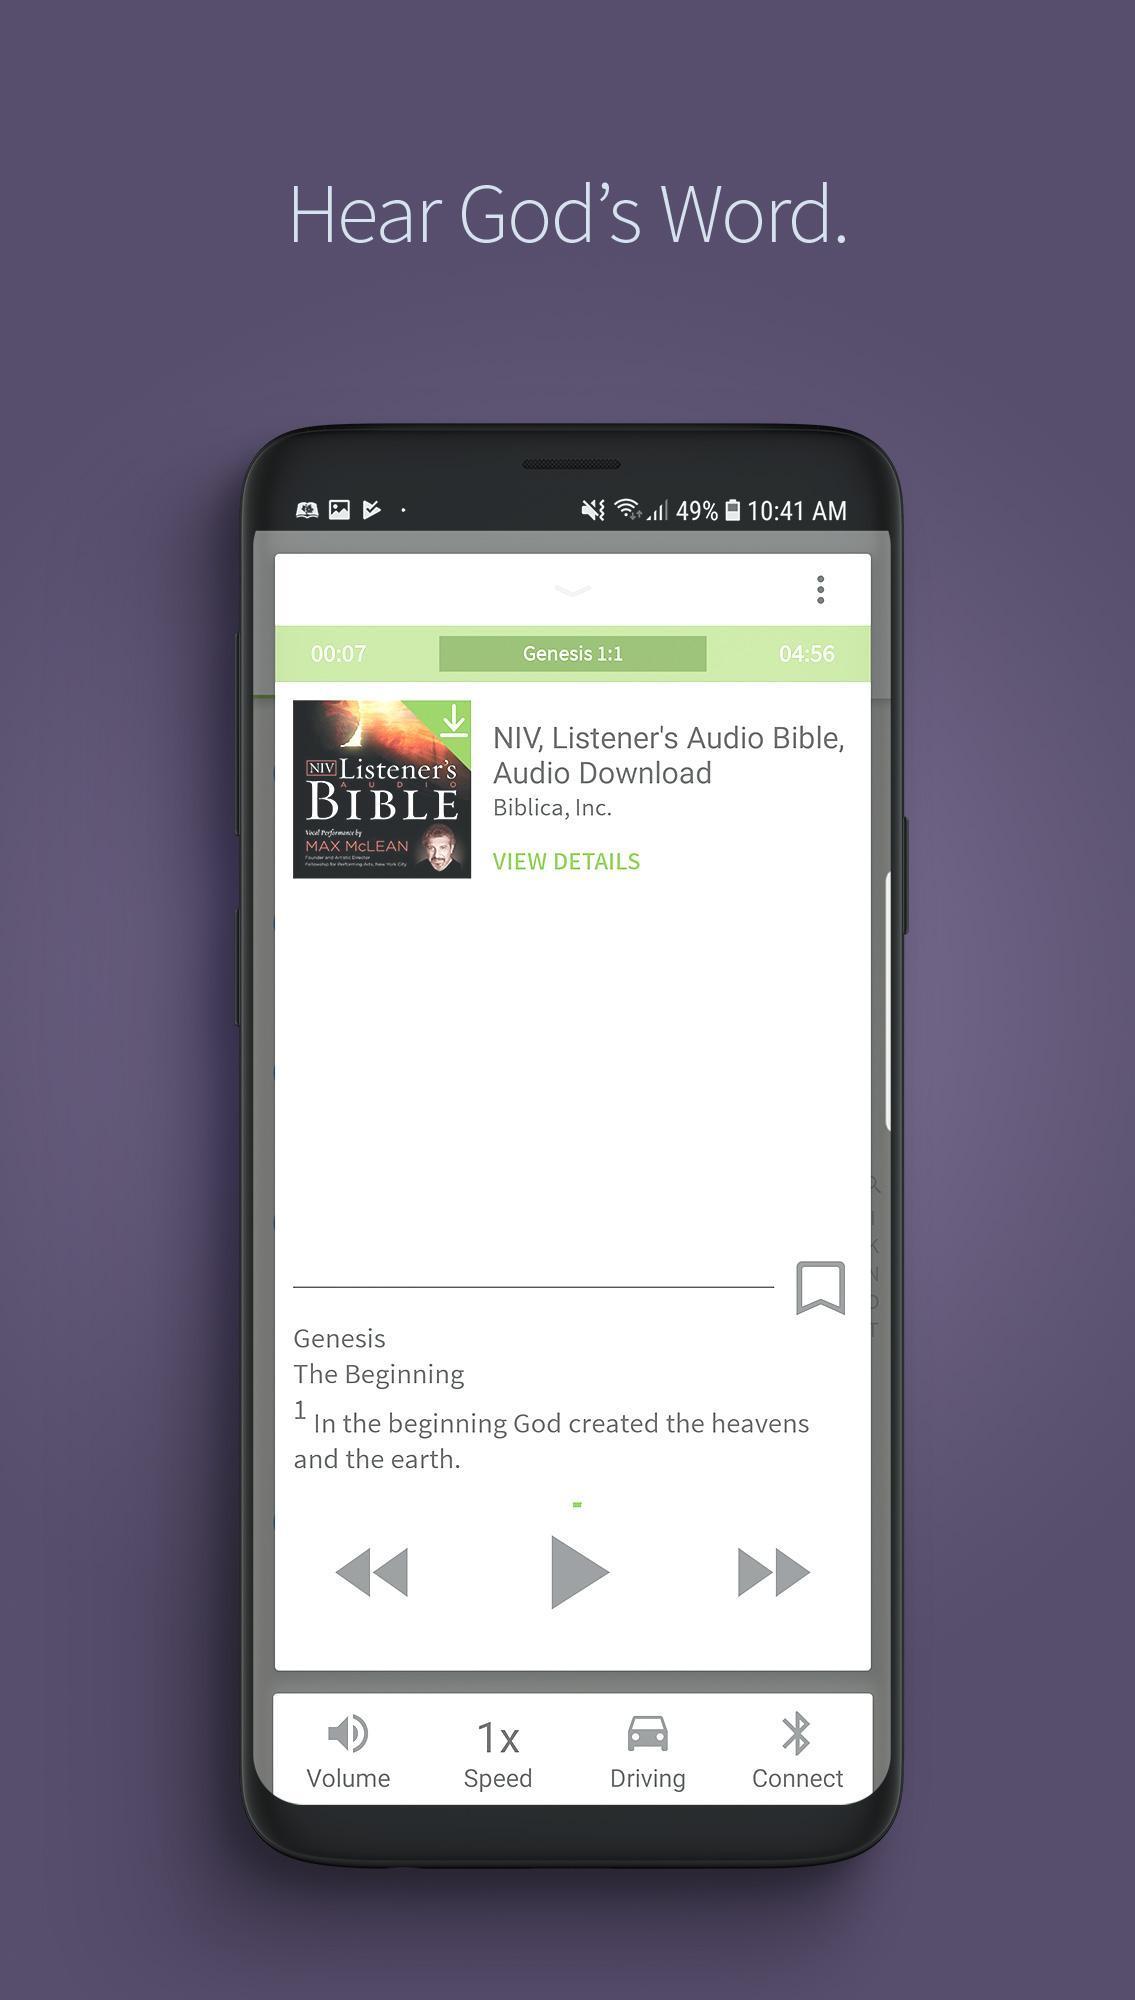 Bible App by Olive Tree 7.5.4.0.5664 Screenshot 2